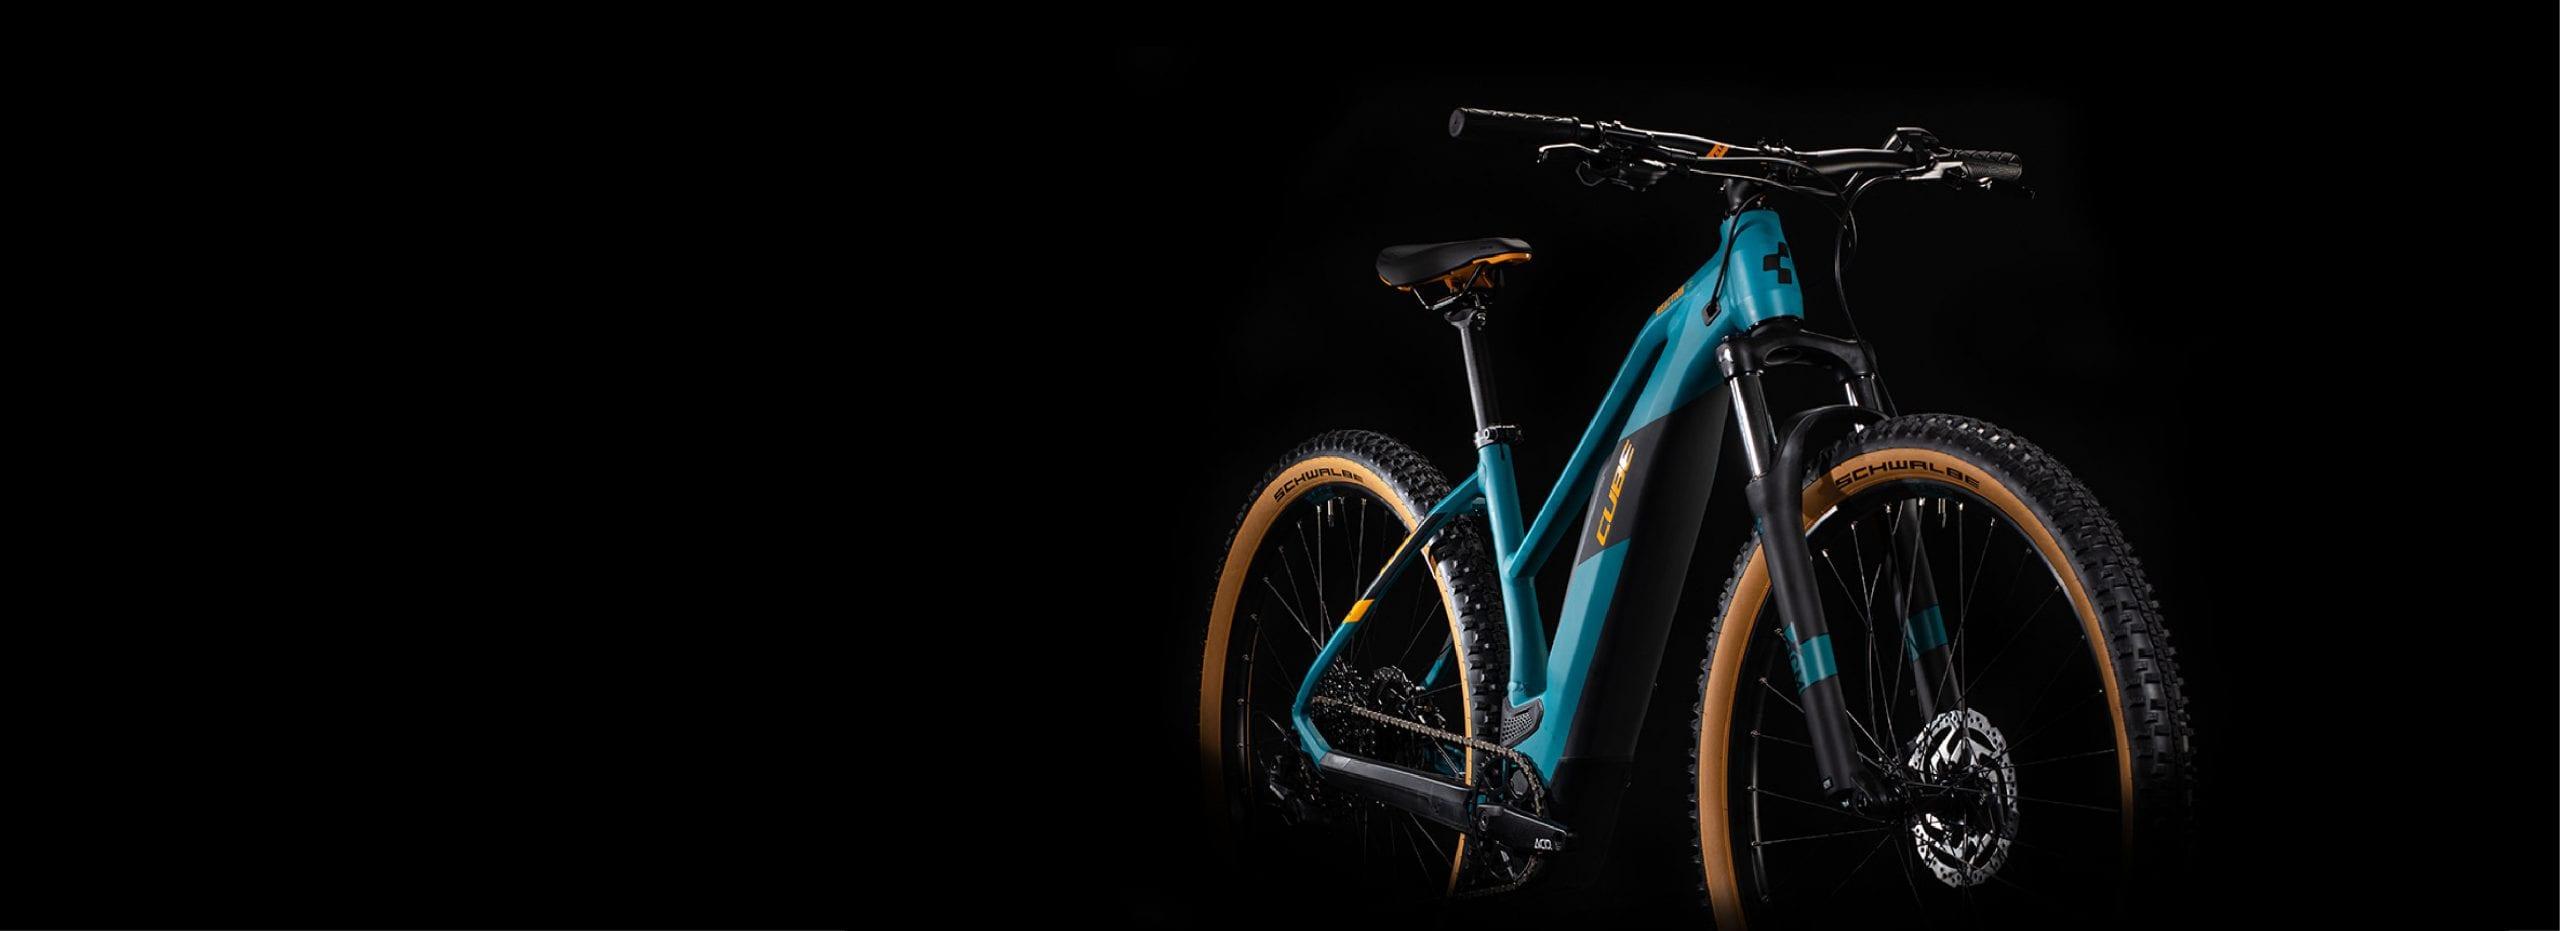 Cube Reaction Hybrid Bike with Black Background